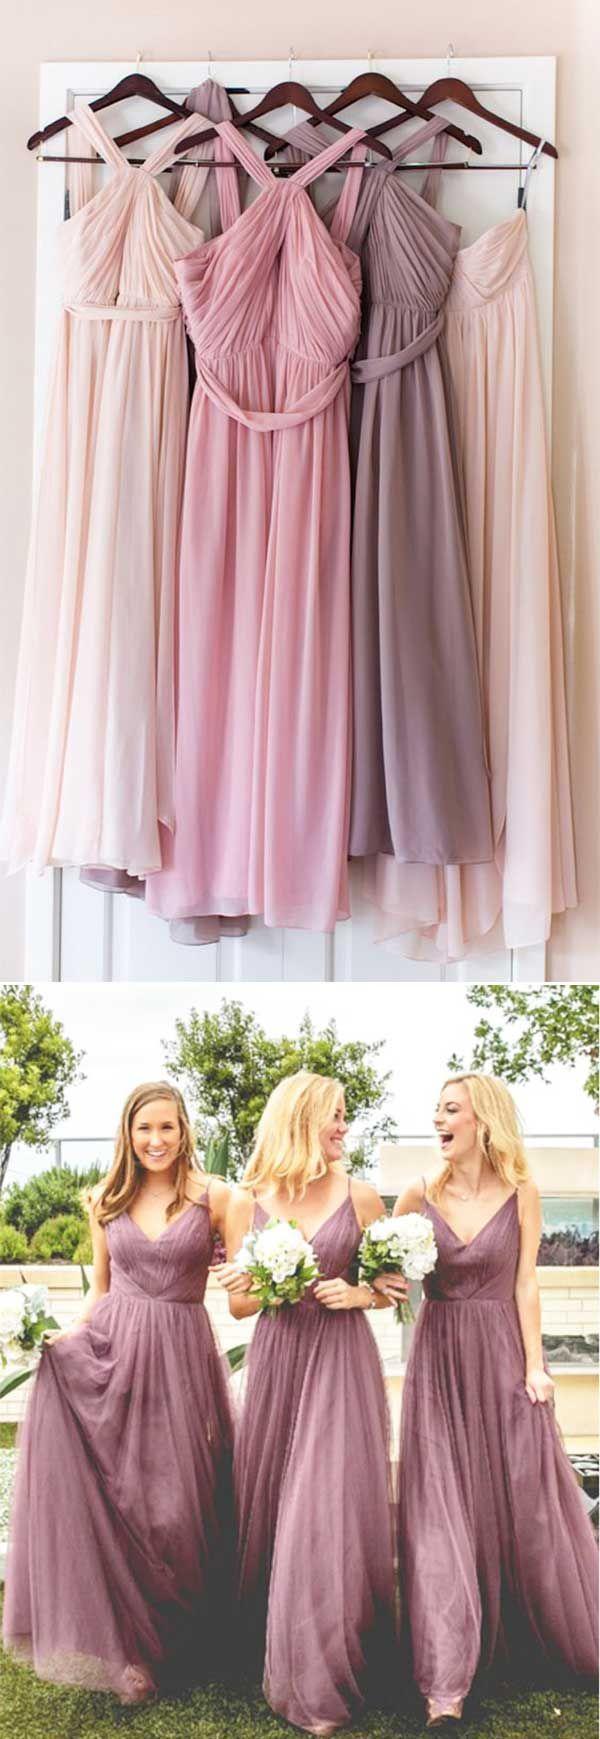 1294 best Wedding Ideas images on Pinterest | Wedding ideas ...